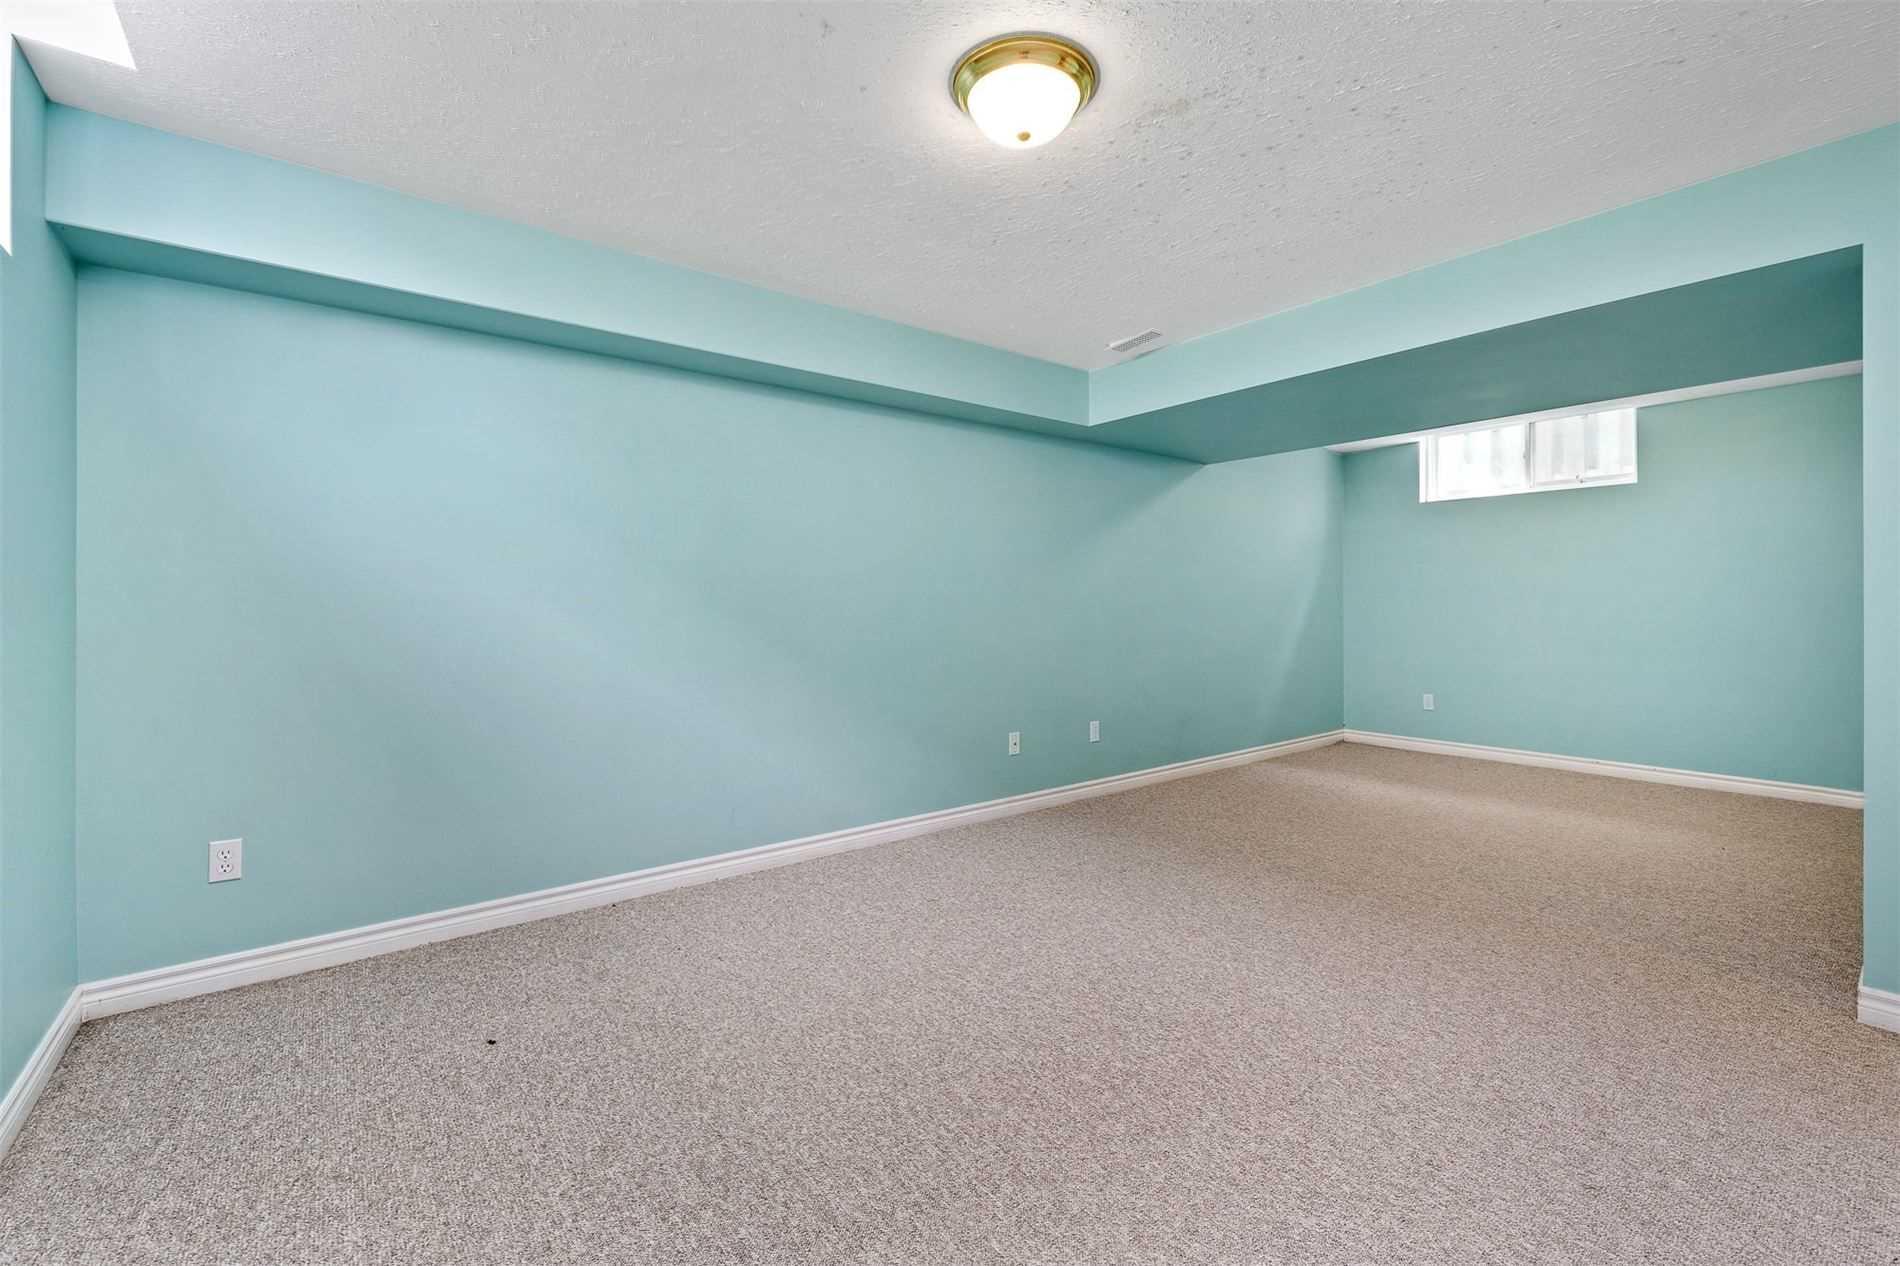 Detached house For Sale In Kawartha Lakes - 25 Durham St, Kawartha Lakes, Ontario, Canada K9V2P3 , 3 Bedrooms Bedrooms, ,2 BathroomsBathrooms,Detached,For Sale,Durham